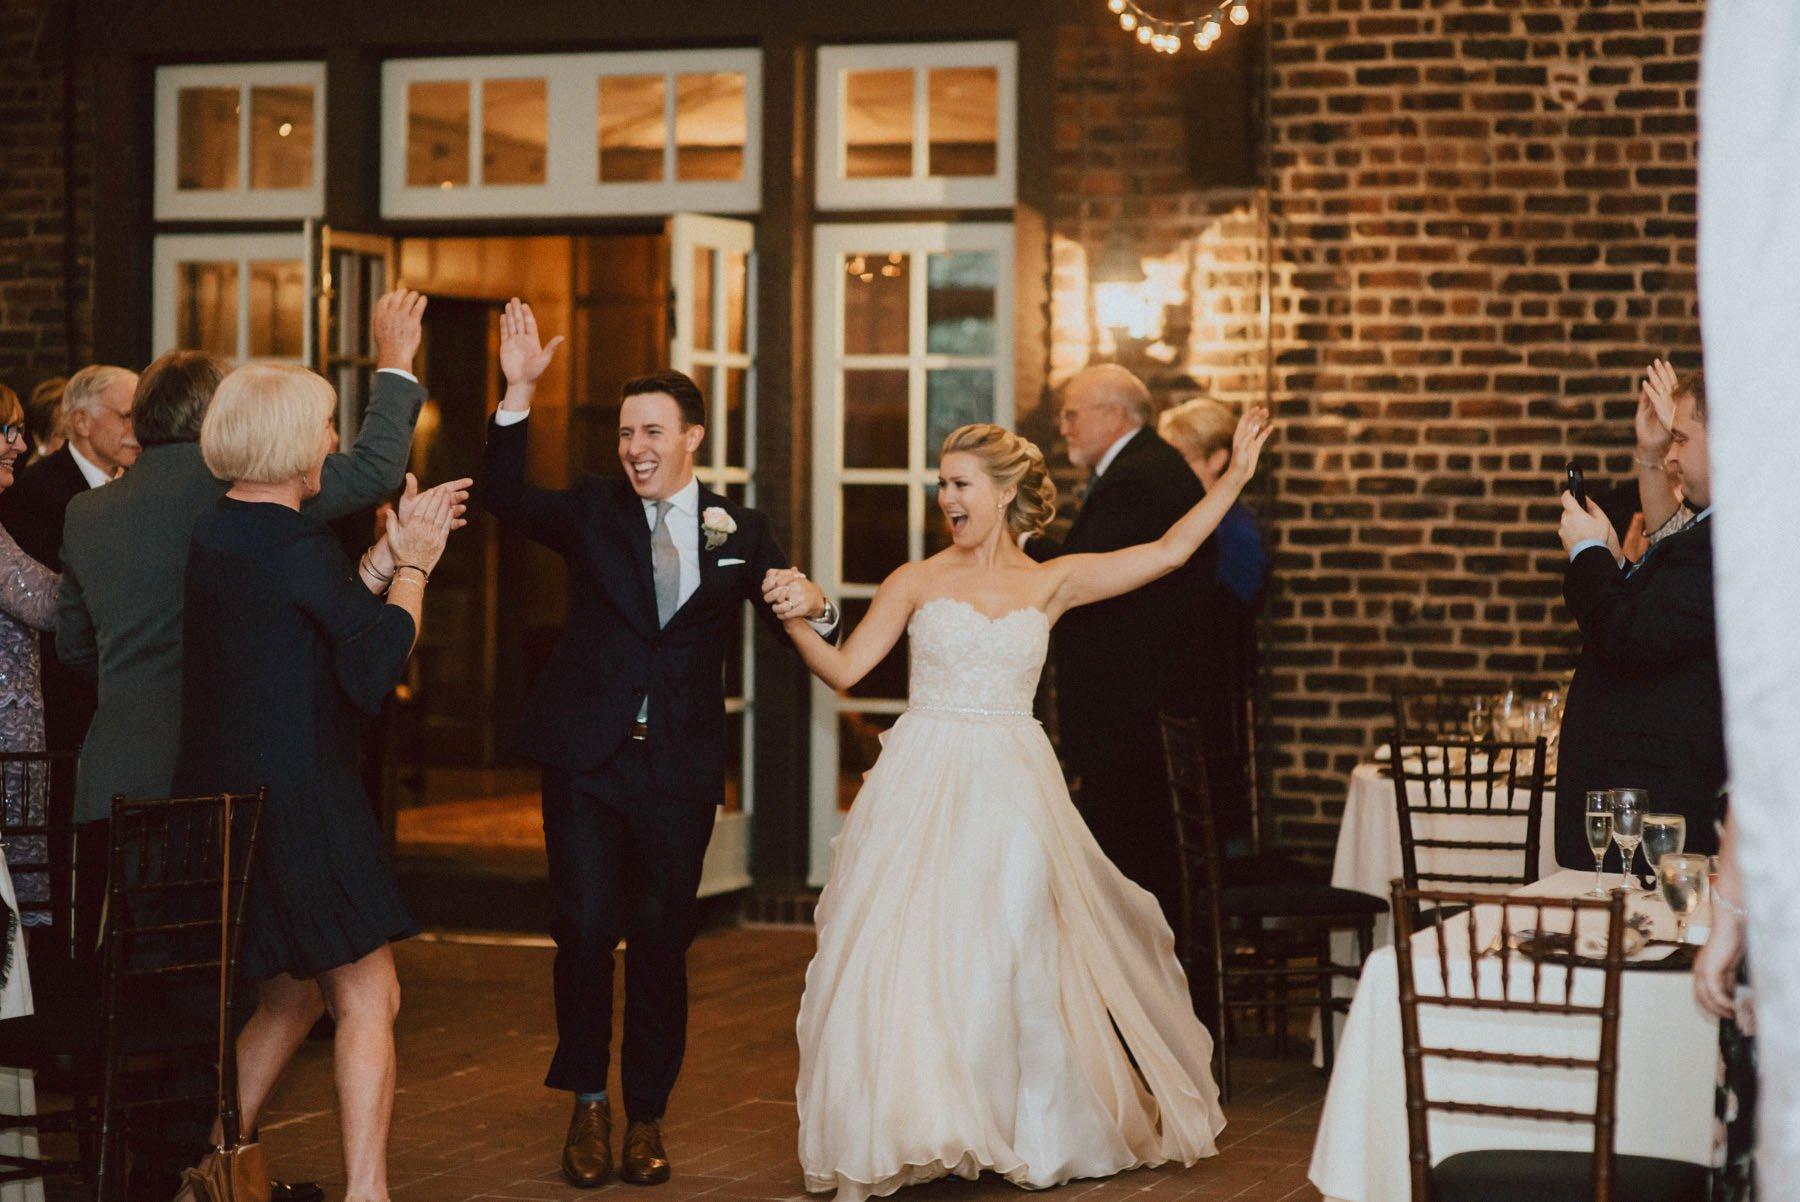 greenville-country-club-wedding-129.jpg